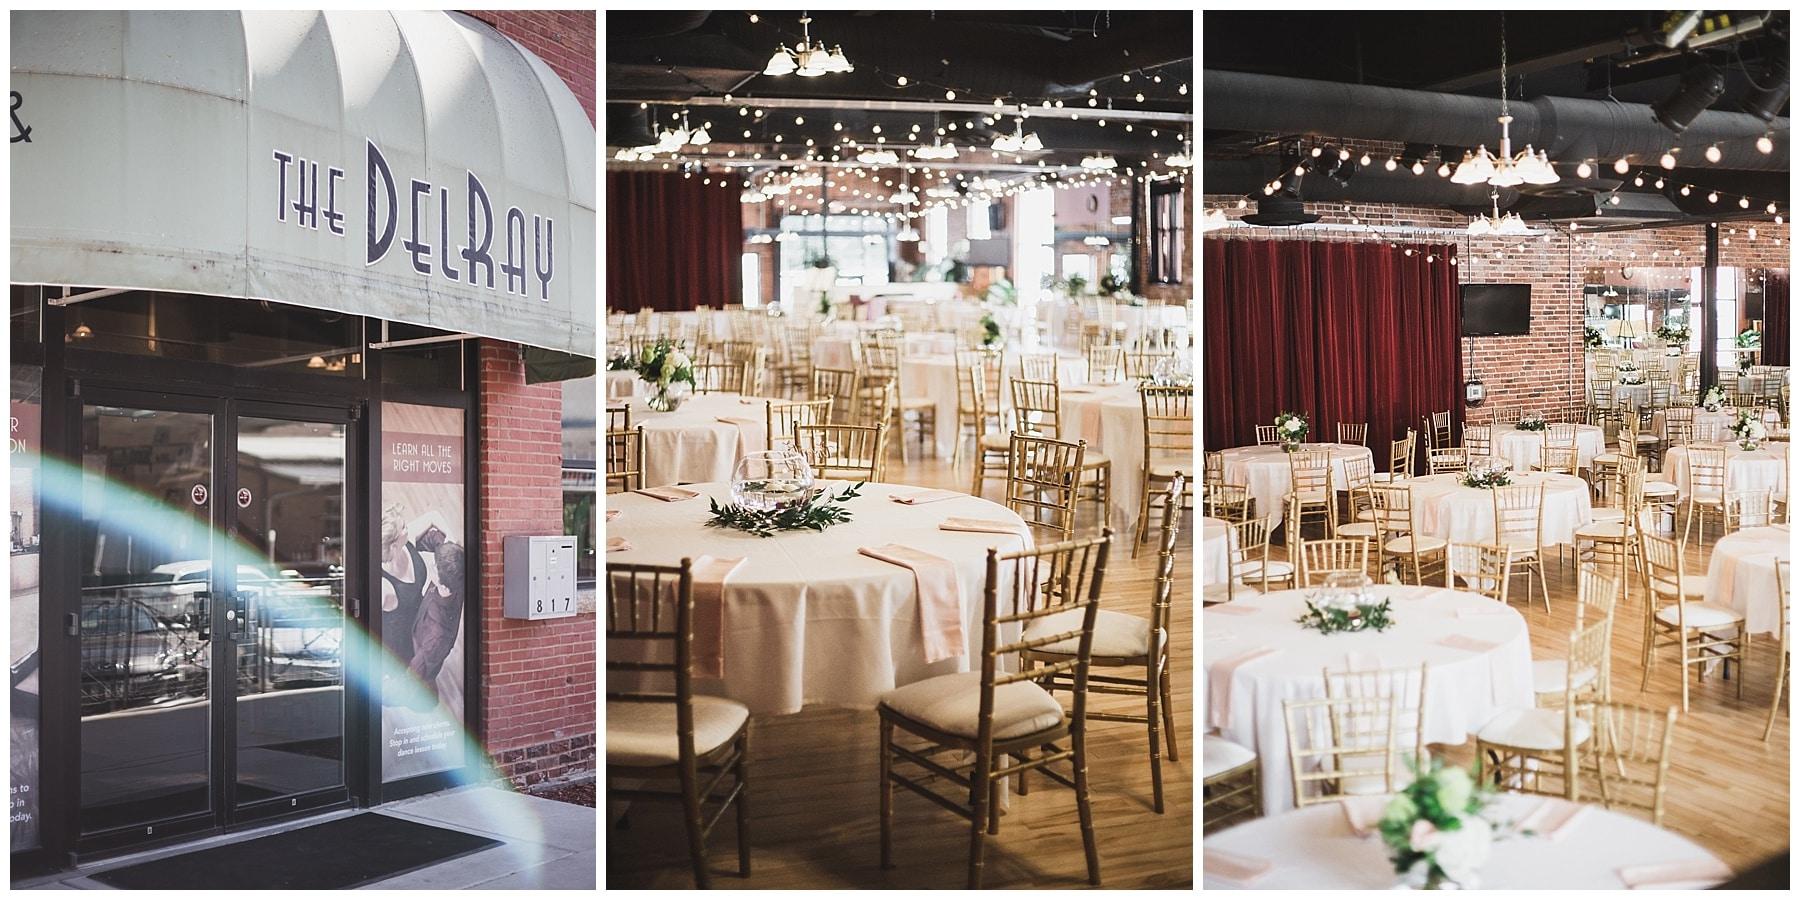 The DelRay Ballroom Lincoln Nebraska Wedding Venues Intrepid Visuals Wedding Photography